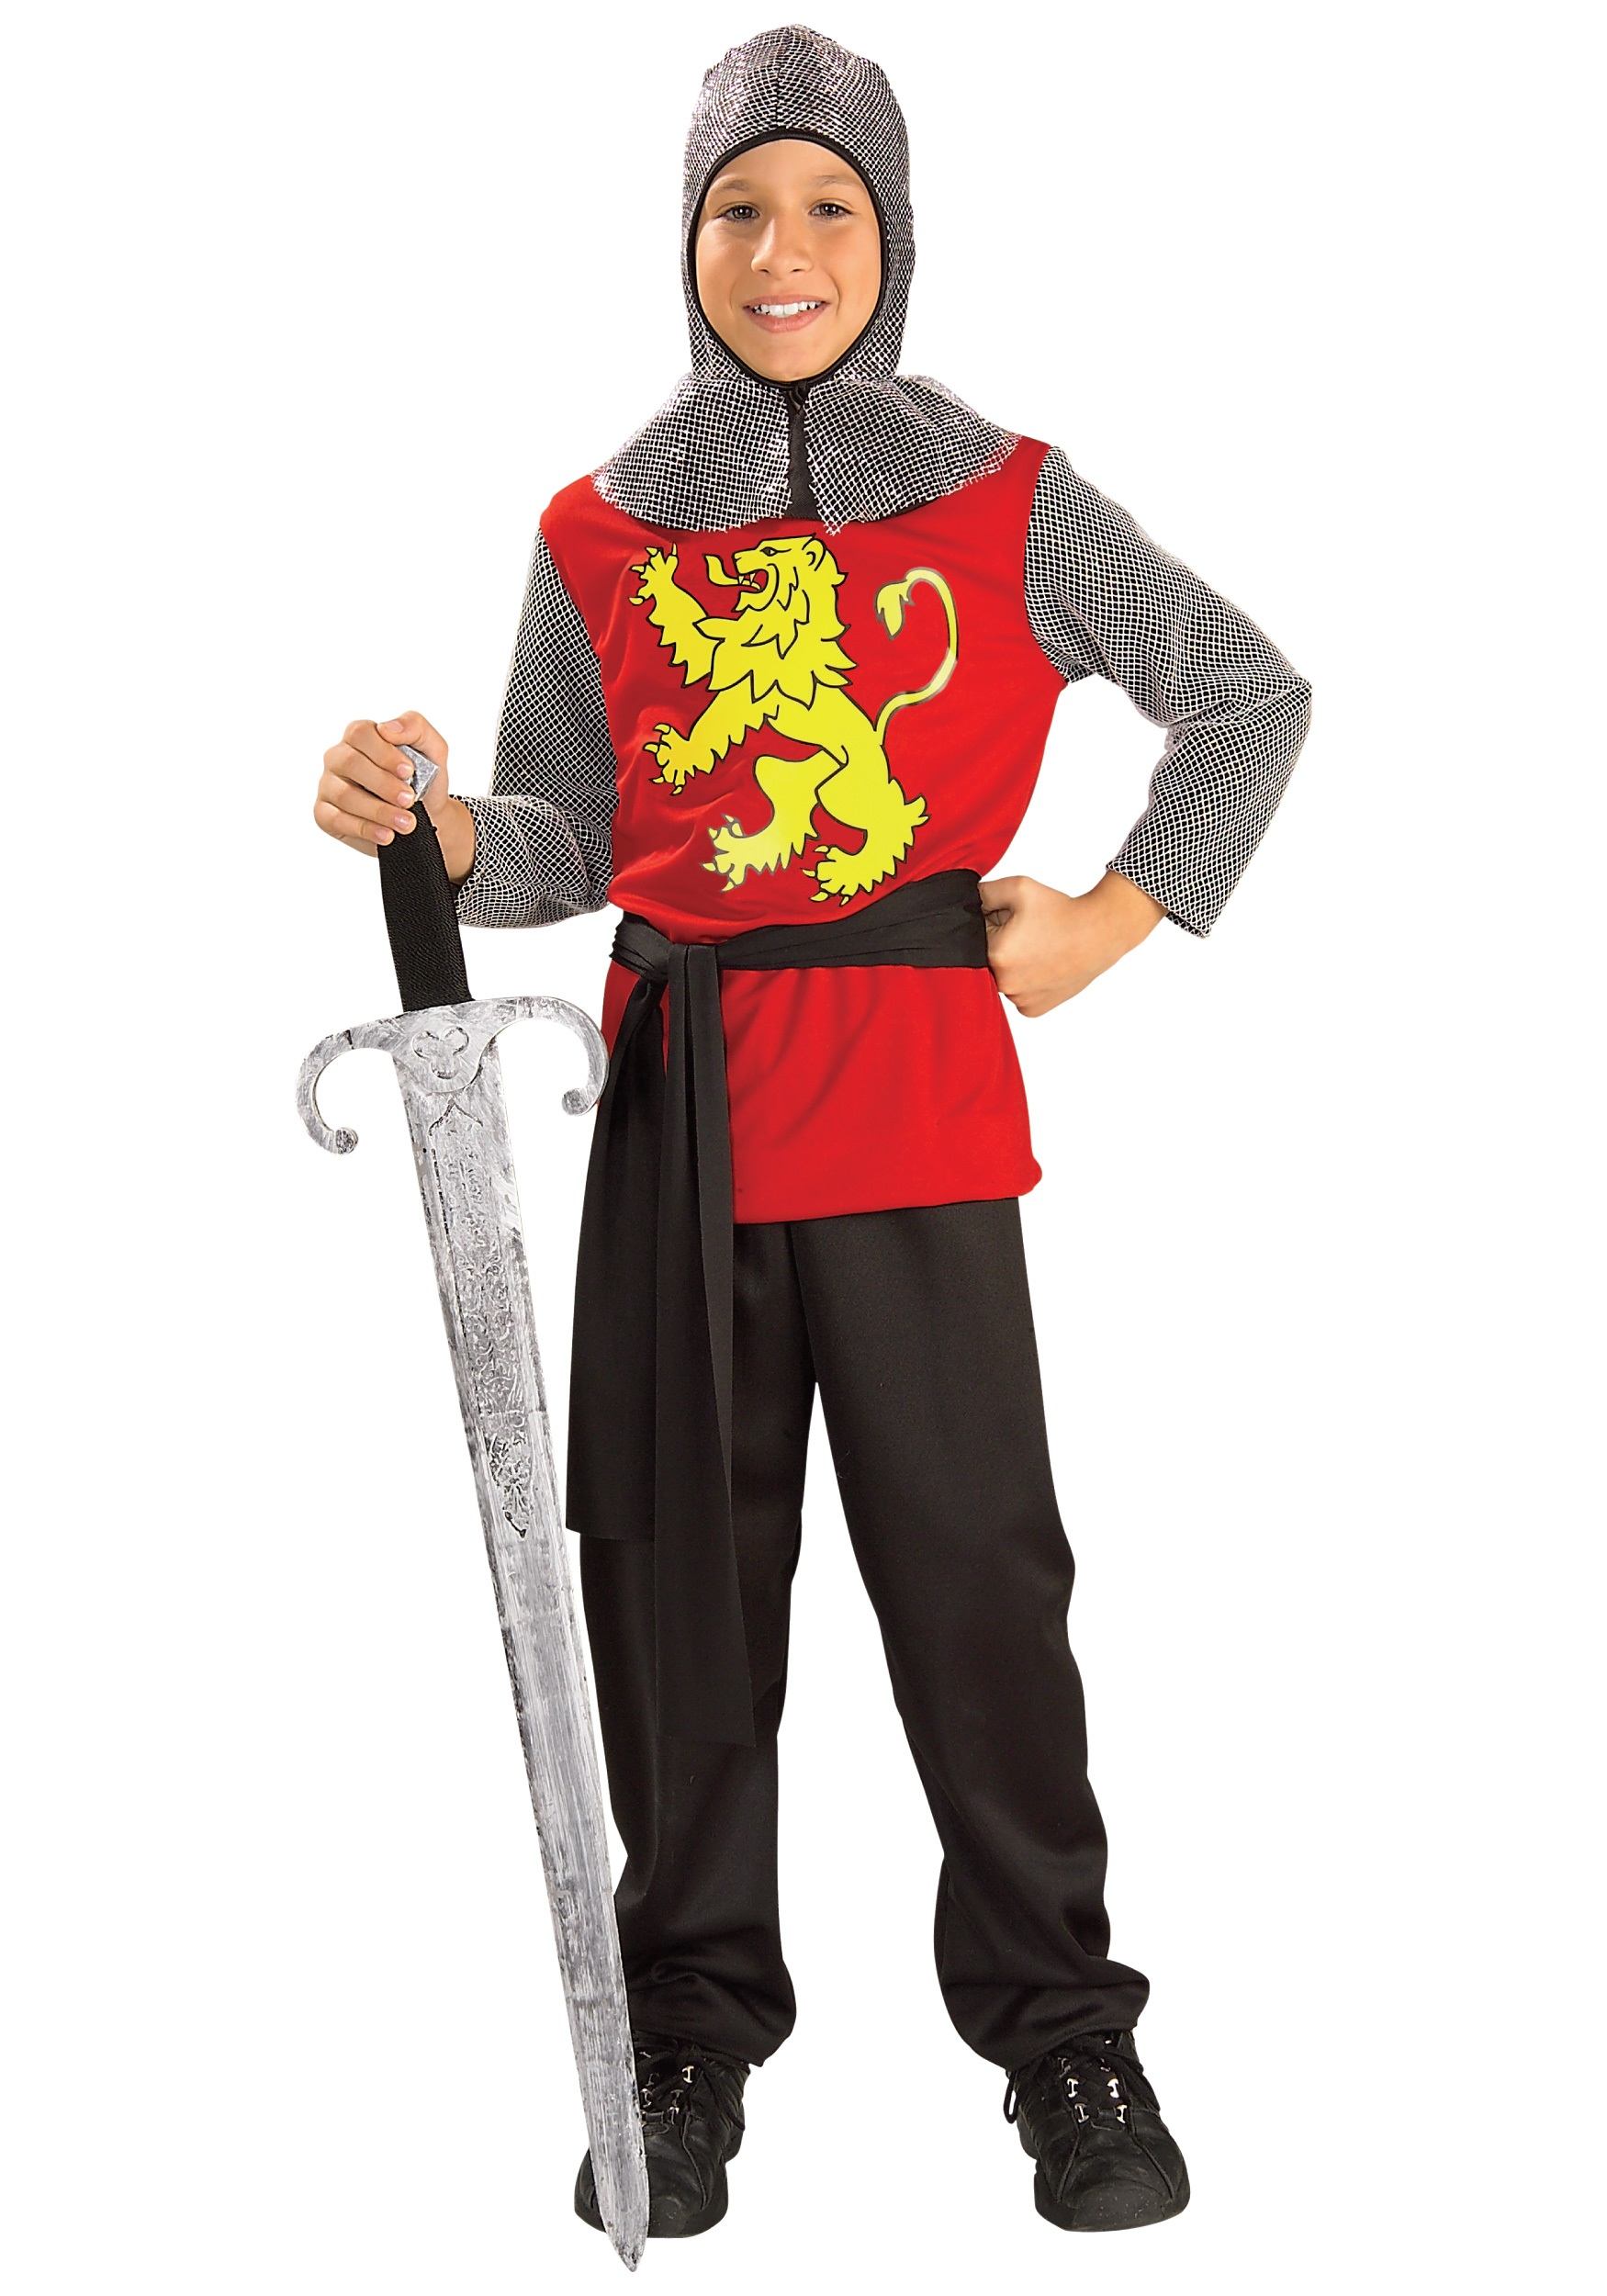 Kids Medieval Knight Costume  sc 1 st  Halloween Costume & Historical Costumes - Adult Child Historical Halloween Costume